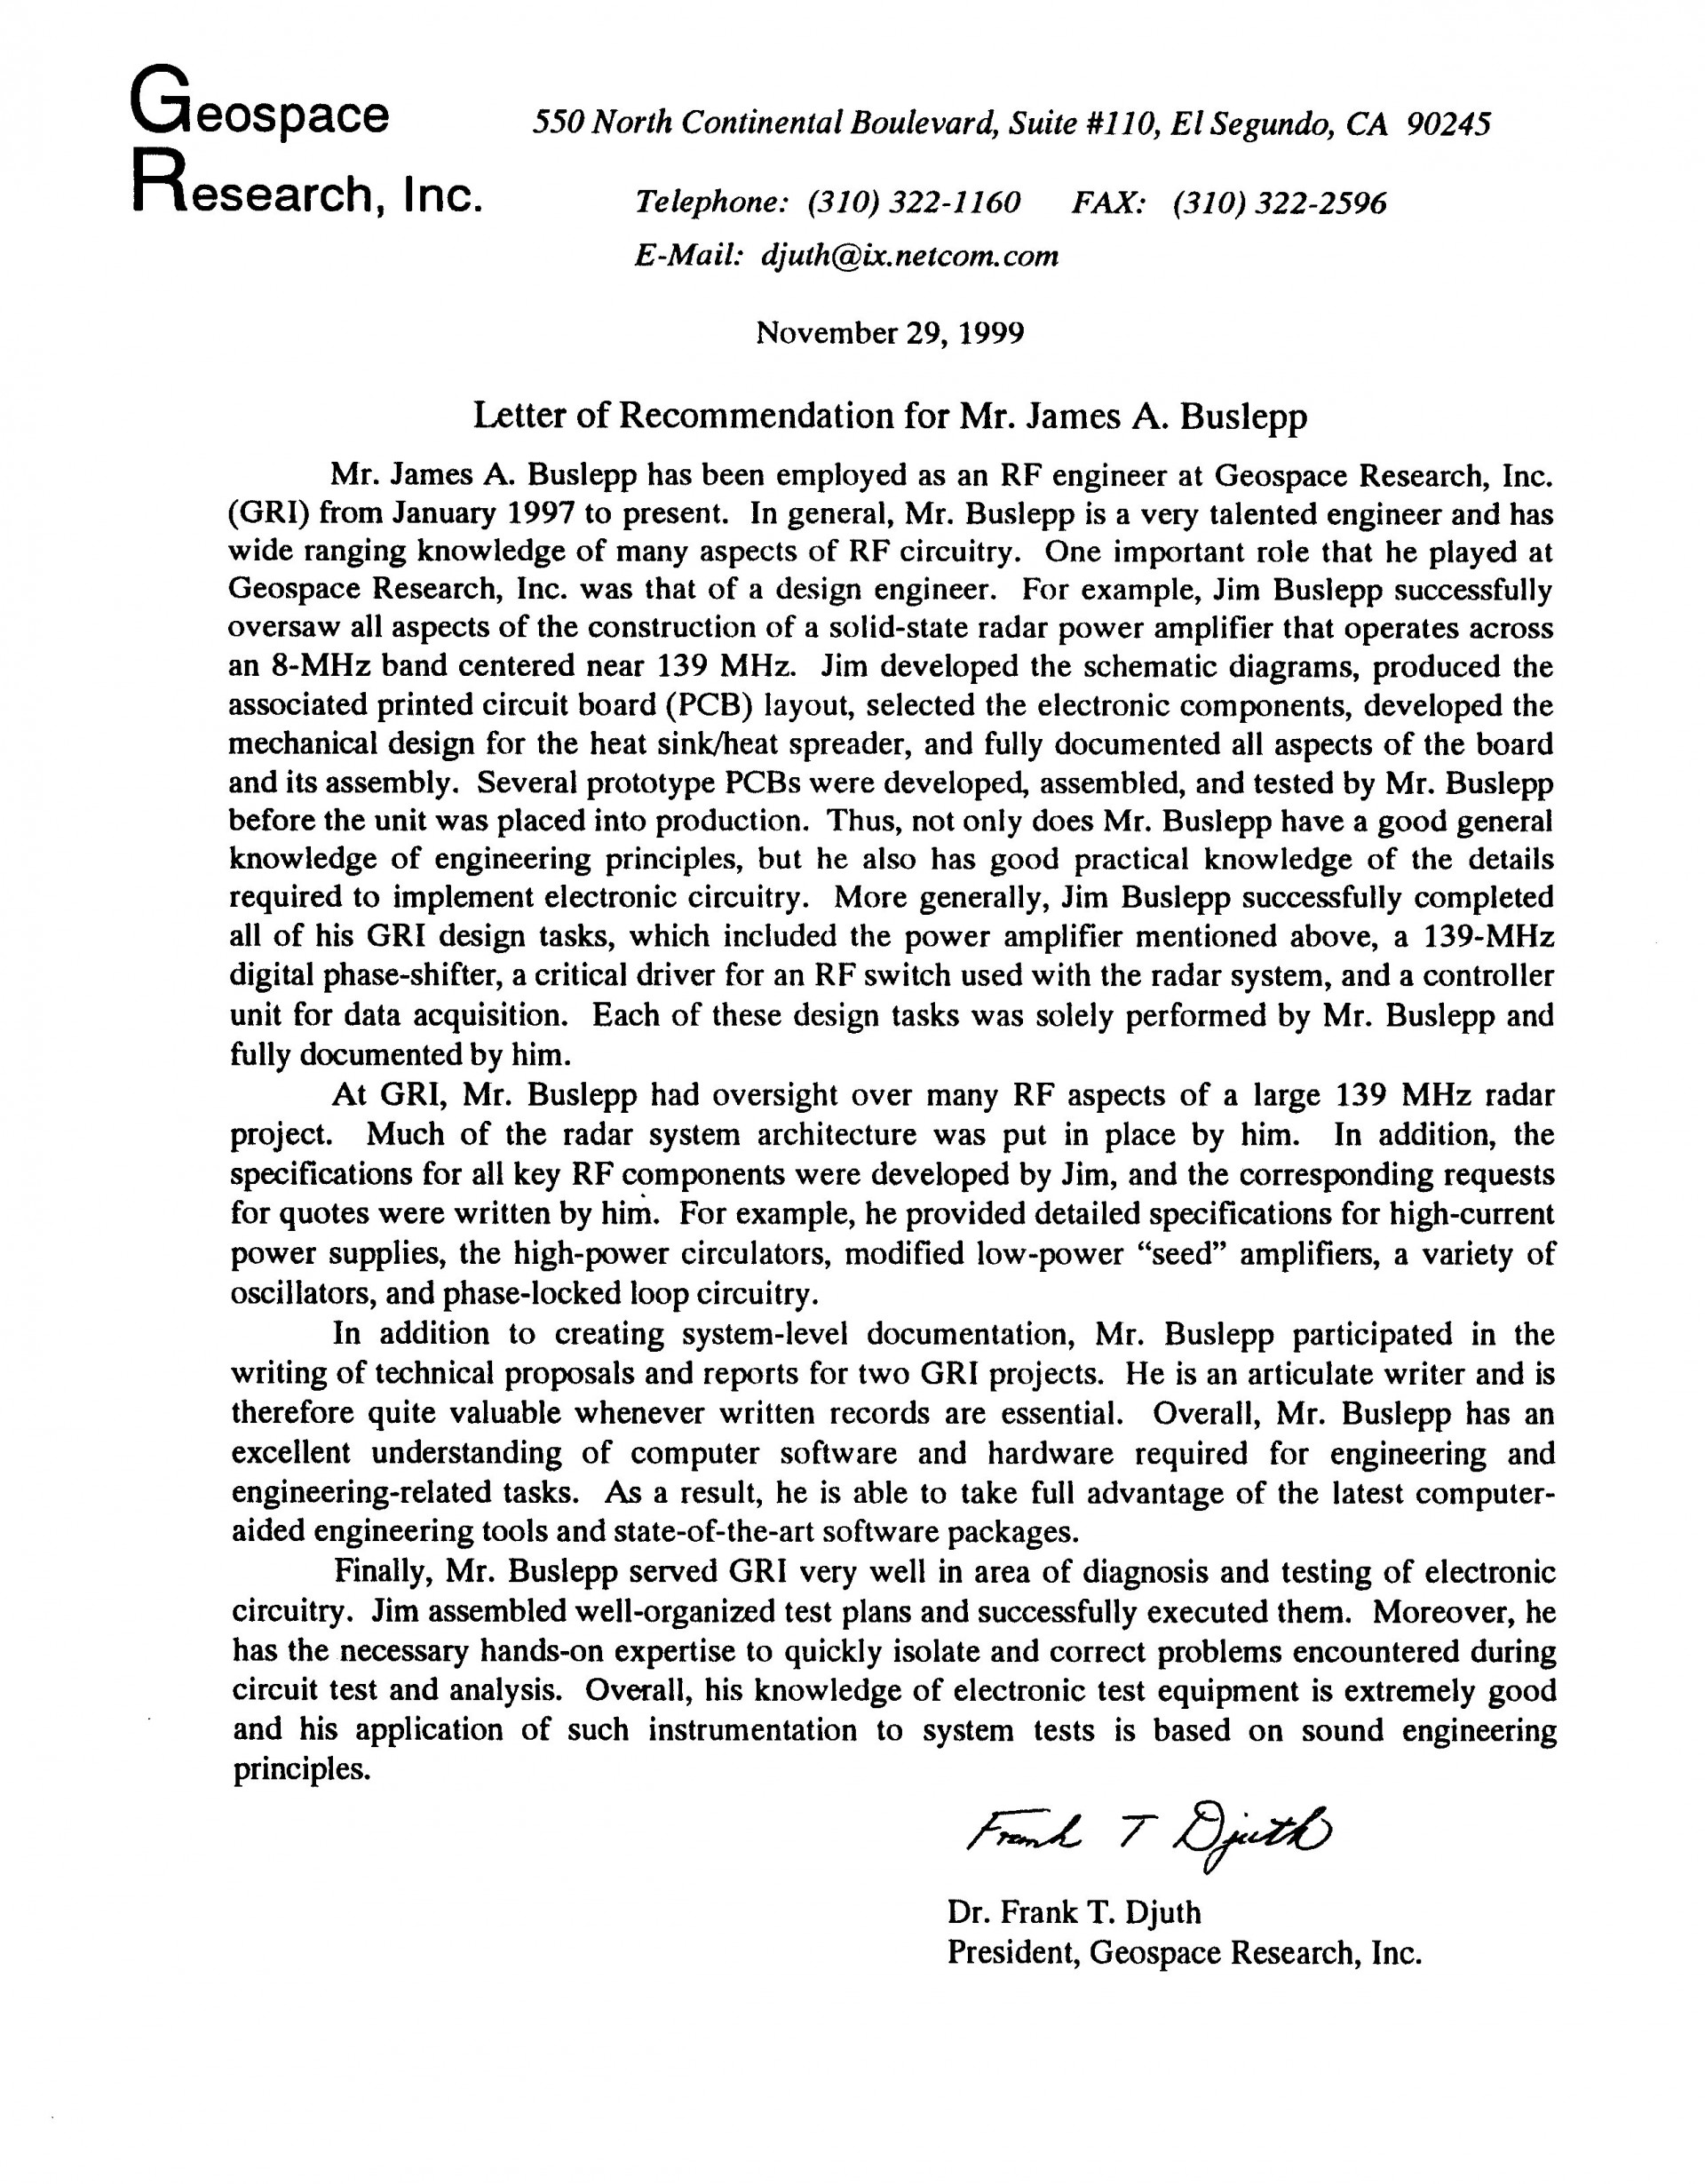 001 Essay Example Good Medical School Essays Examples Pics Diversity Sample Harvard Secondary Application Med Personal Statement Best 1920